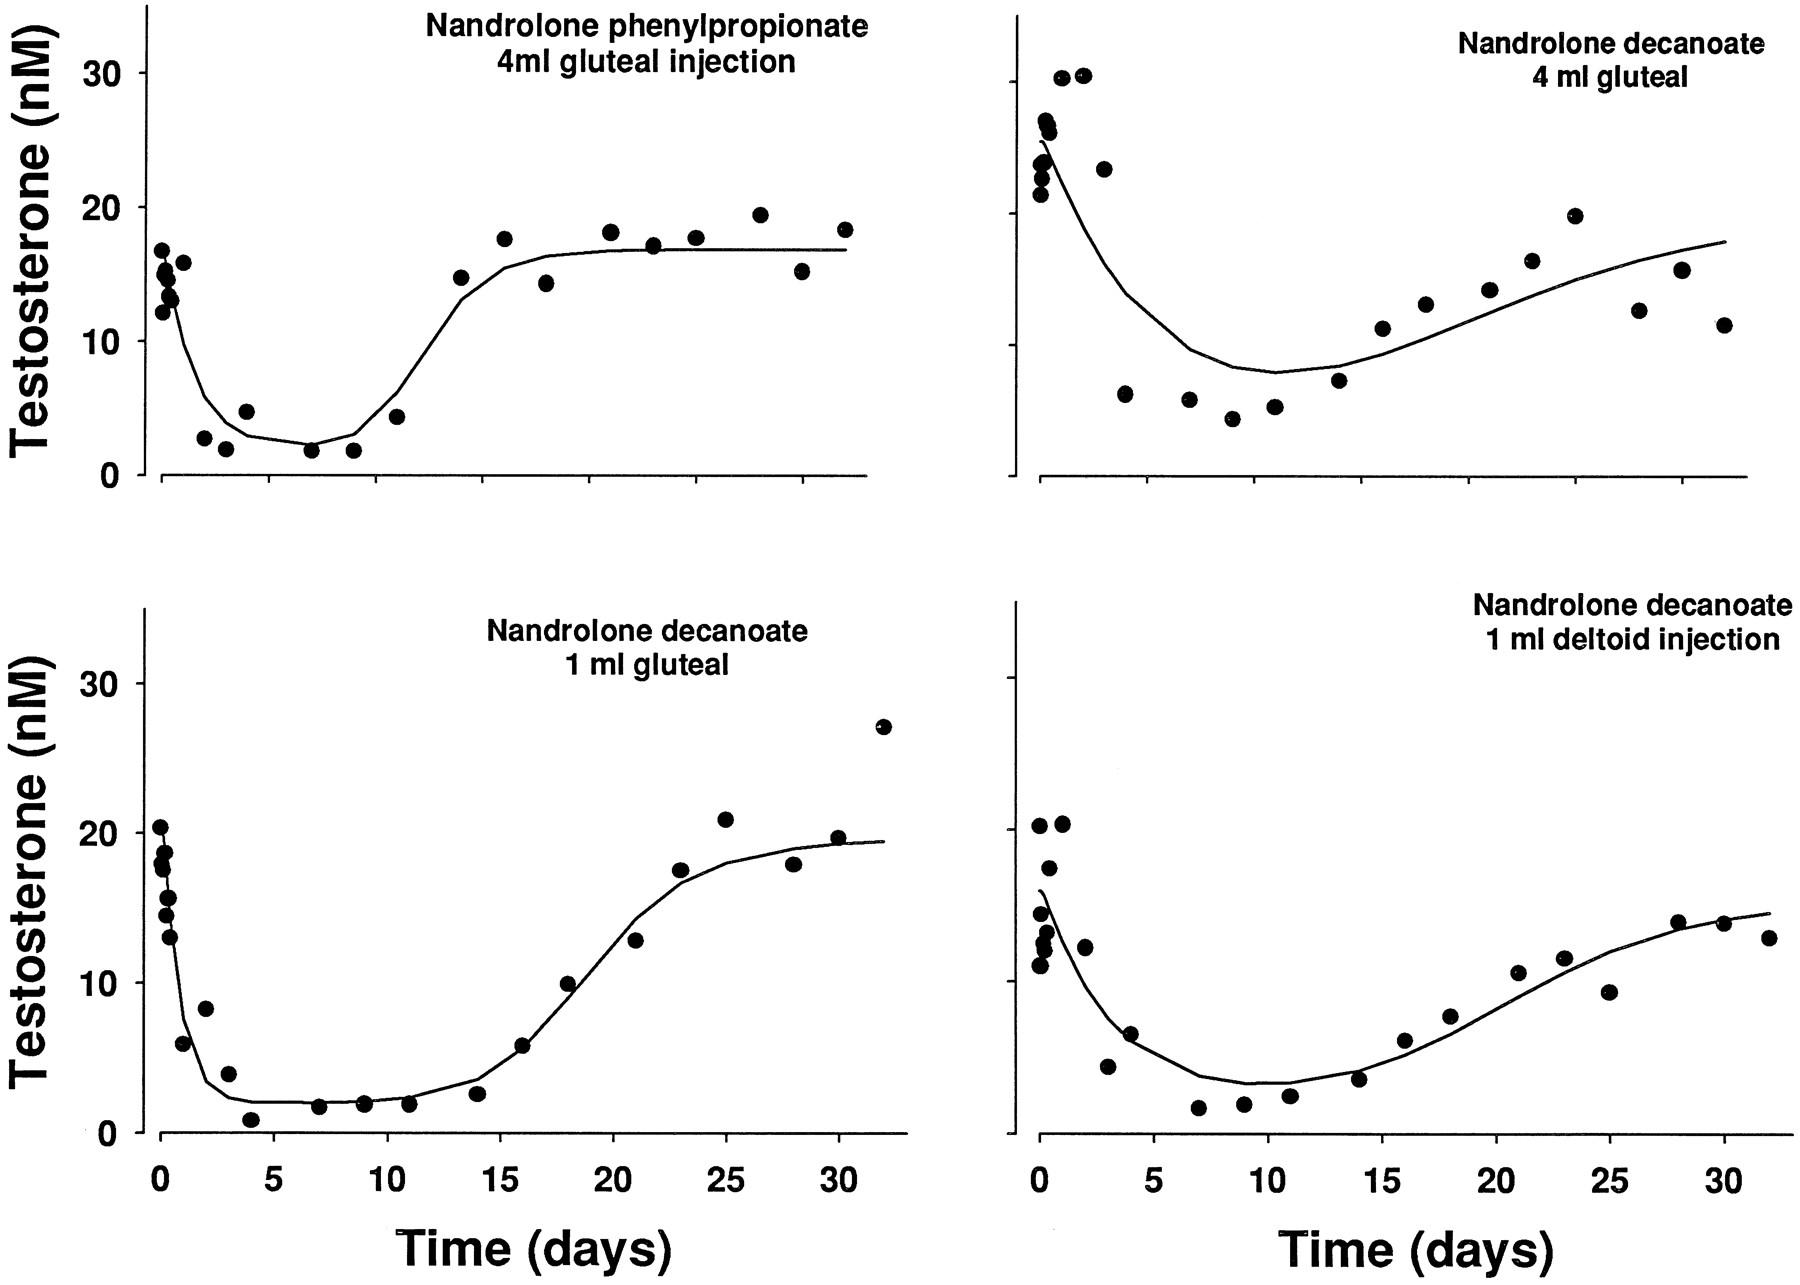 Pharmacokinetics and Pharmacodynamics of Nandrolone Esters